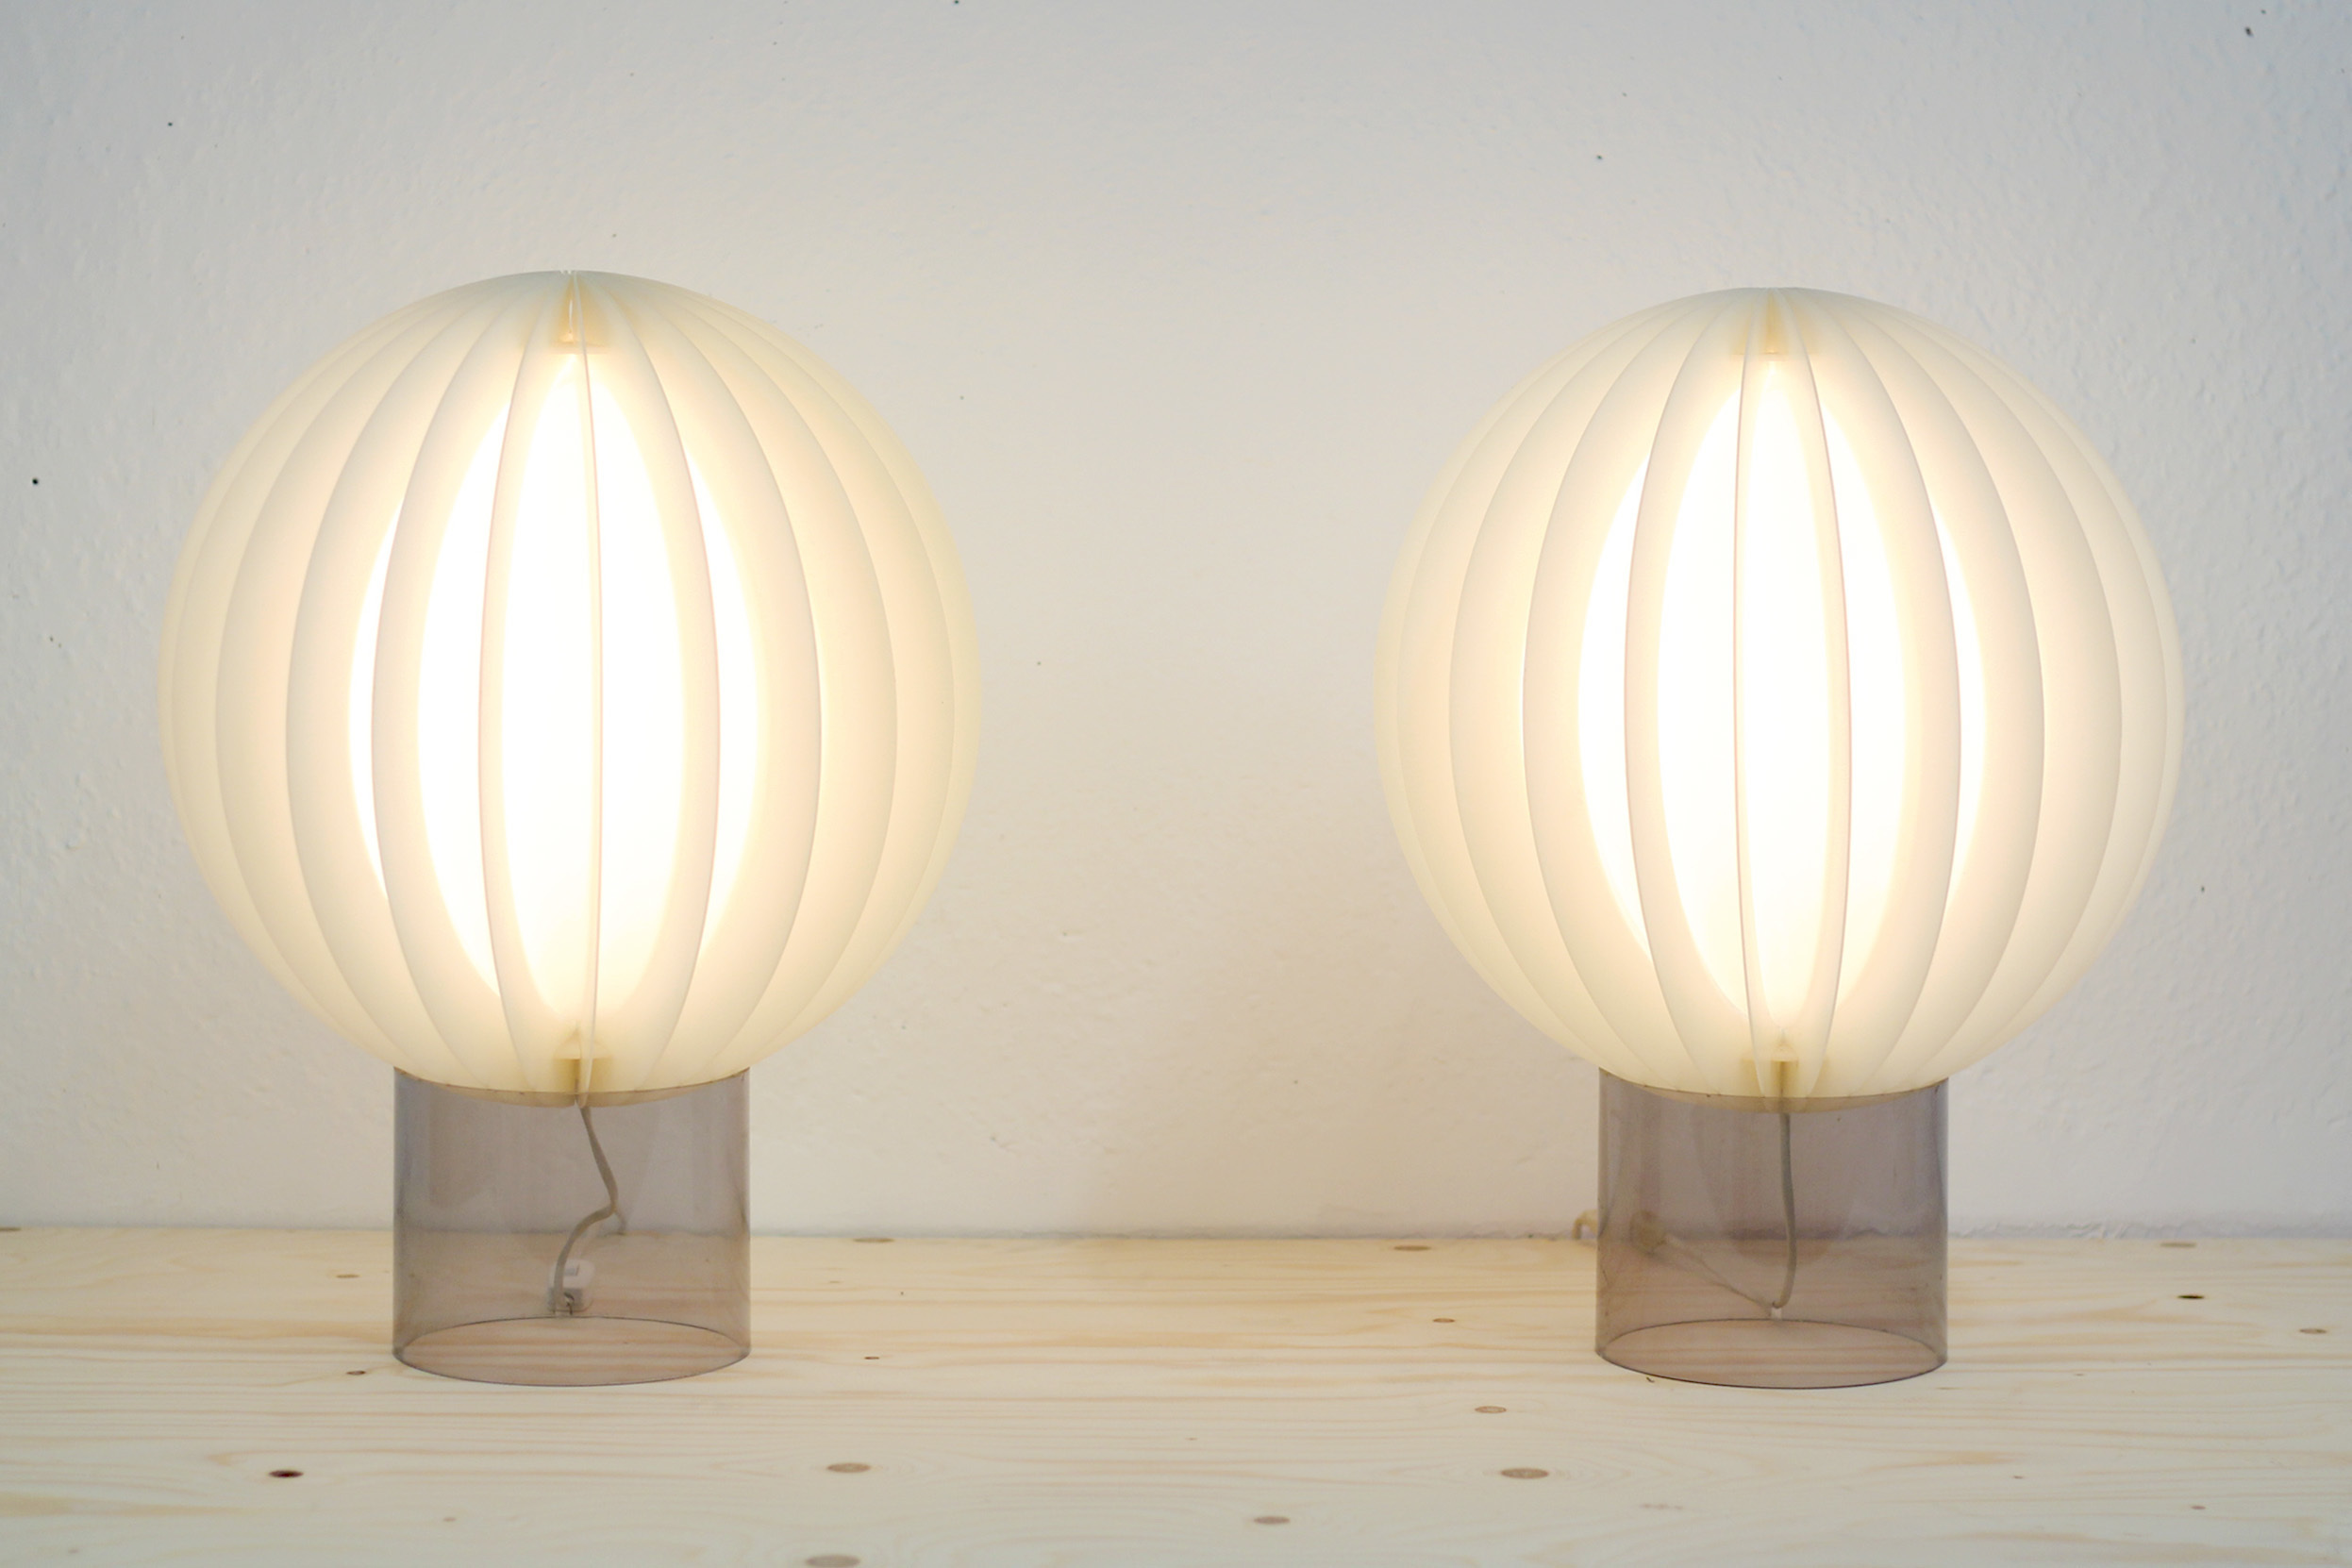 Vintage Mid Century Swedish 1970s Pair Of Cirkel Table Lamps By Ikea Bent Gantzel Boysen Ikea Vinterior